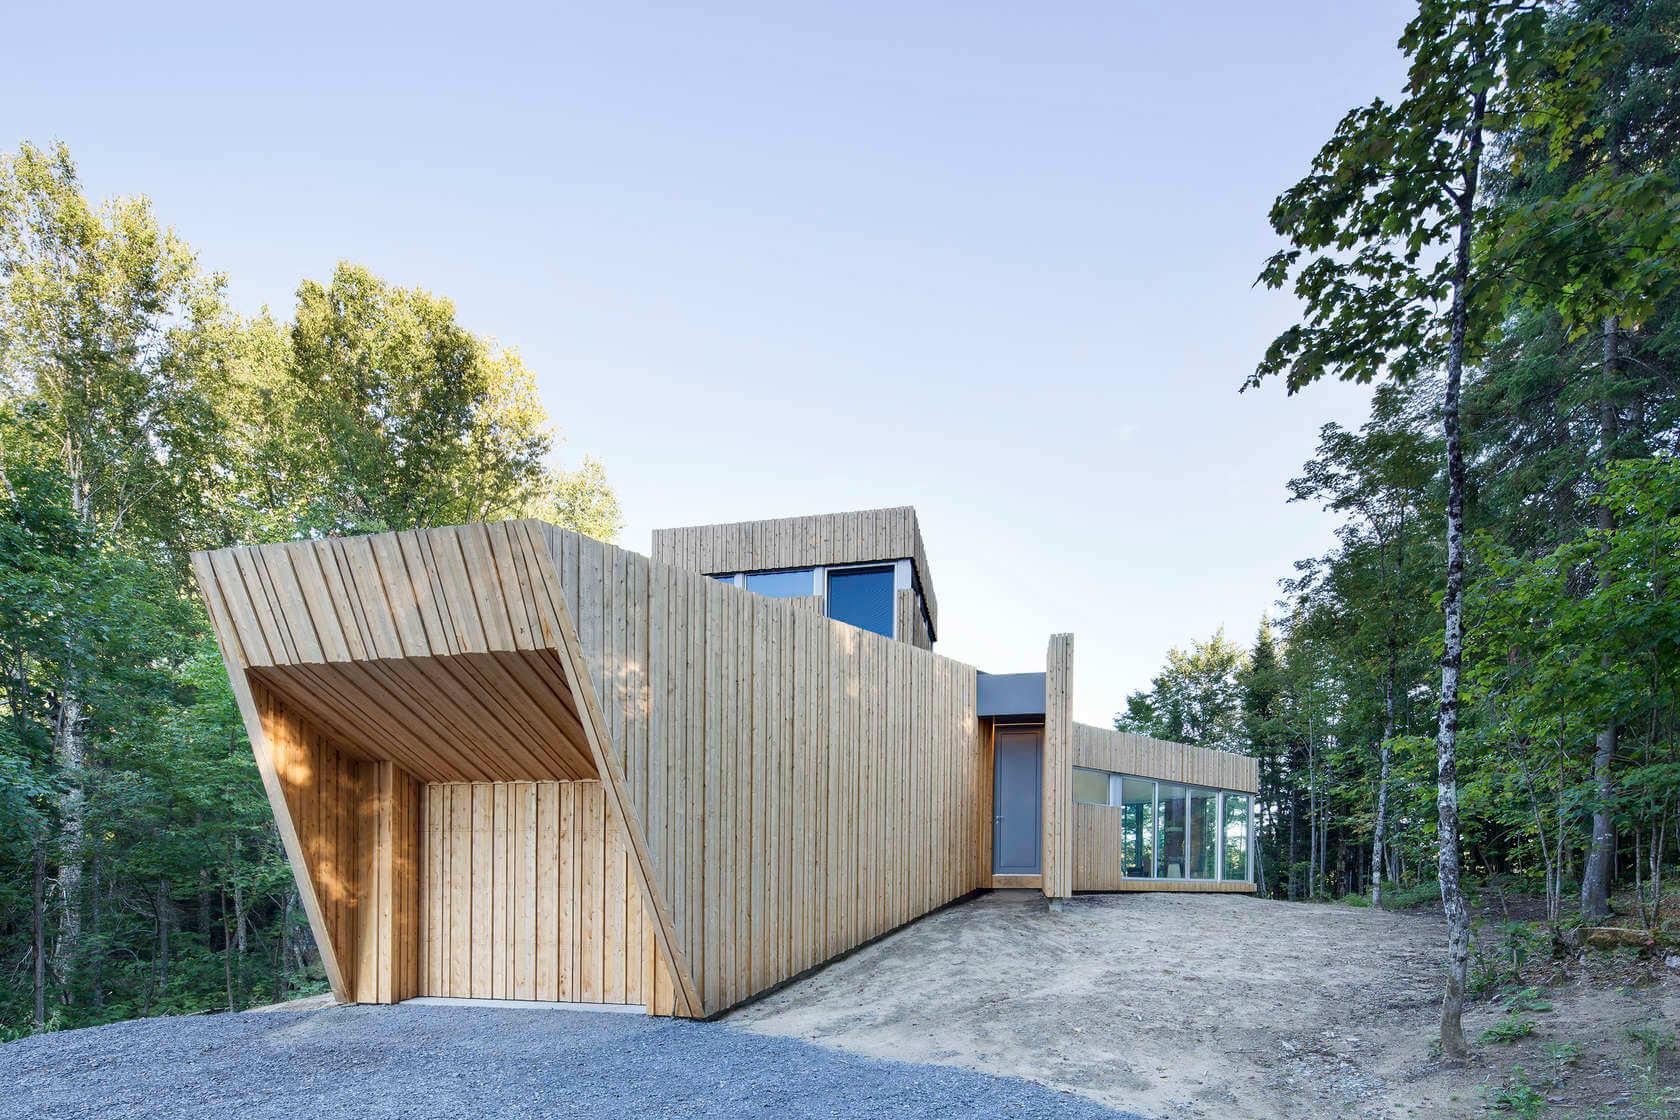 architecture_house_apartment_design_studia_interiors_osnovadesign_osnova_poltava_09